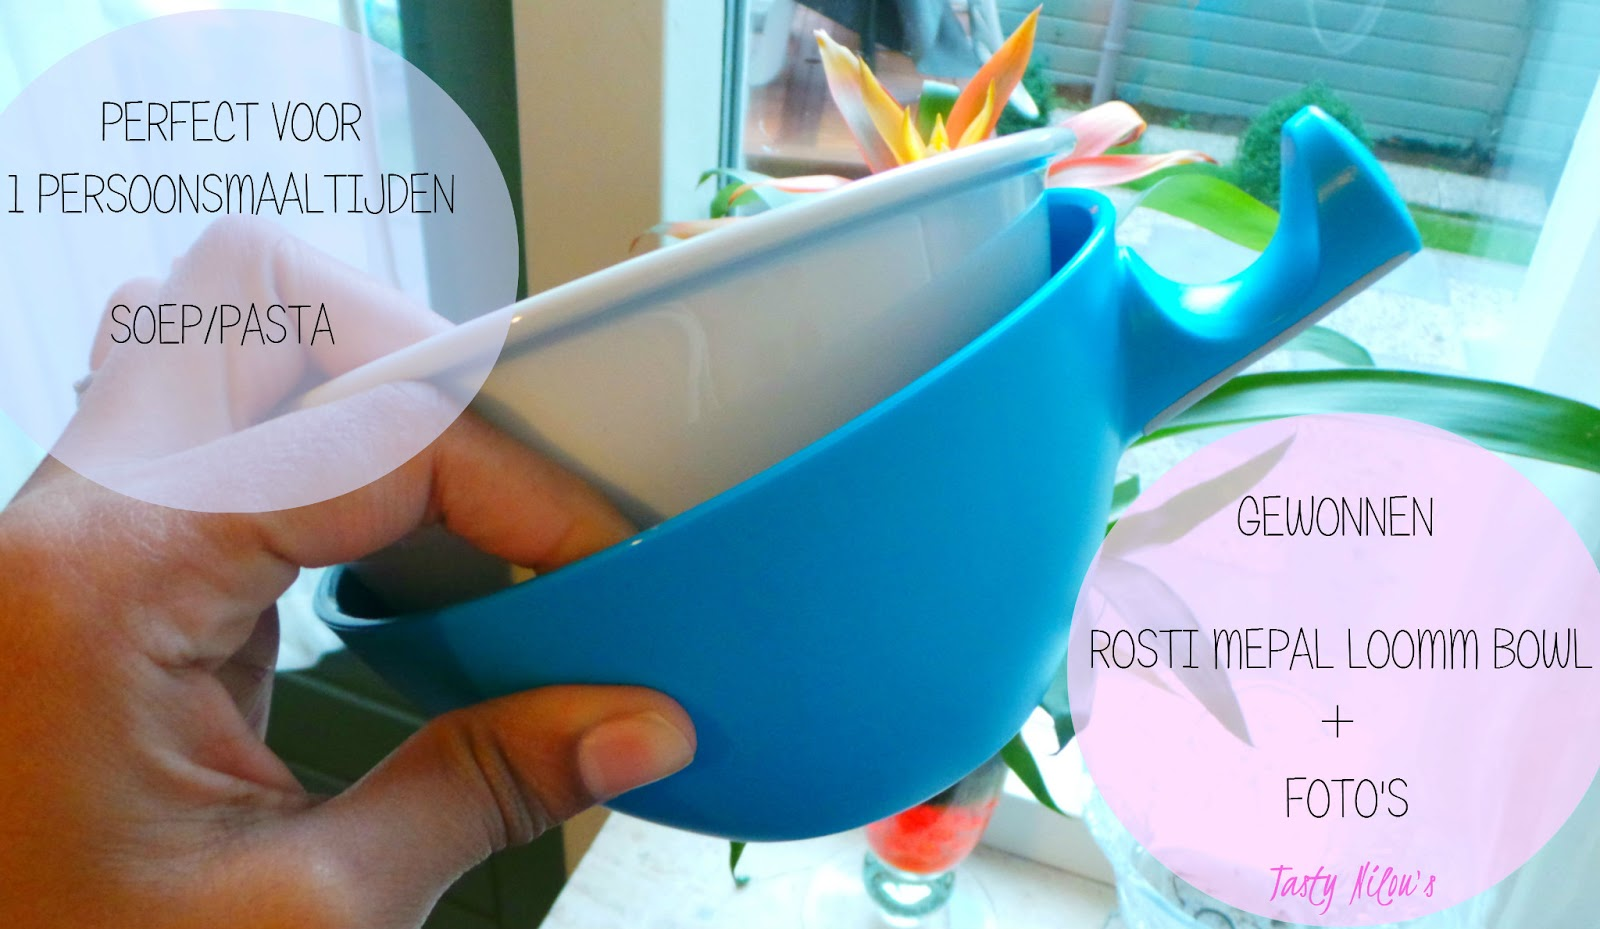 tasty nilou 39 s rosti mepal loomm bowl. Black Bedroom Furniture Sets. Home Design Ideas